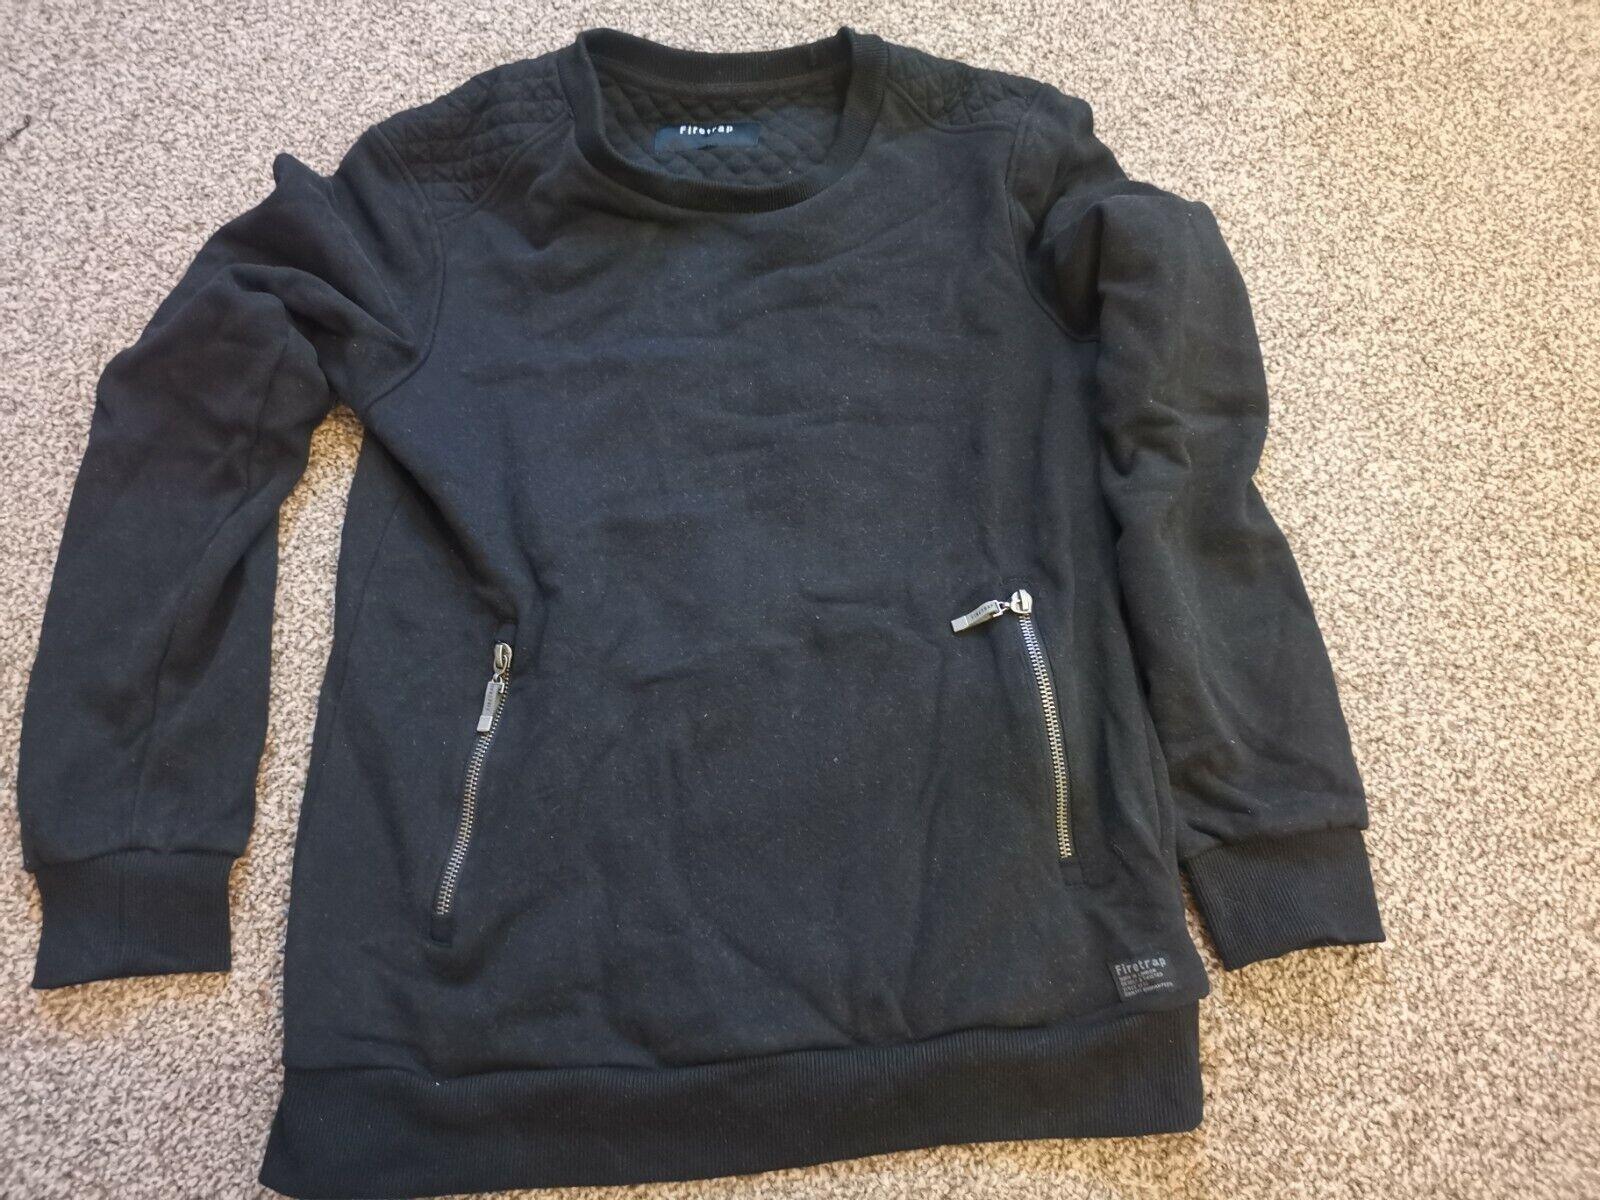 Firetrap Black Mens Top With Zip Details Size S